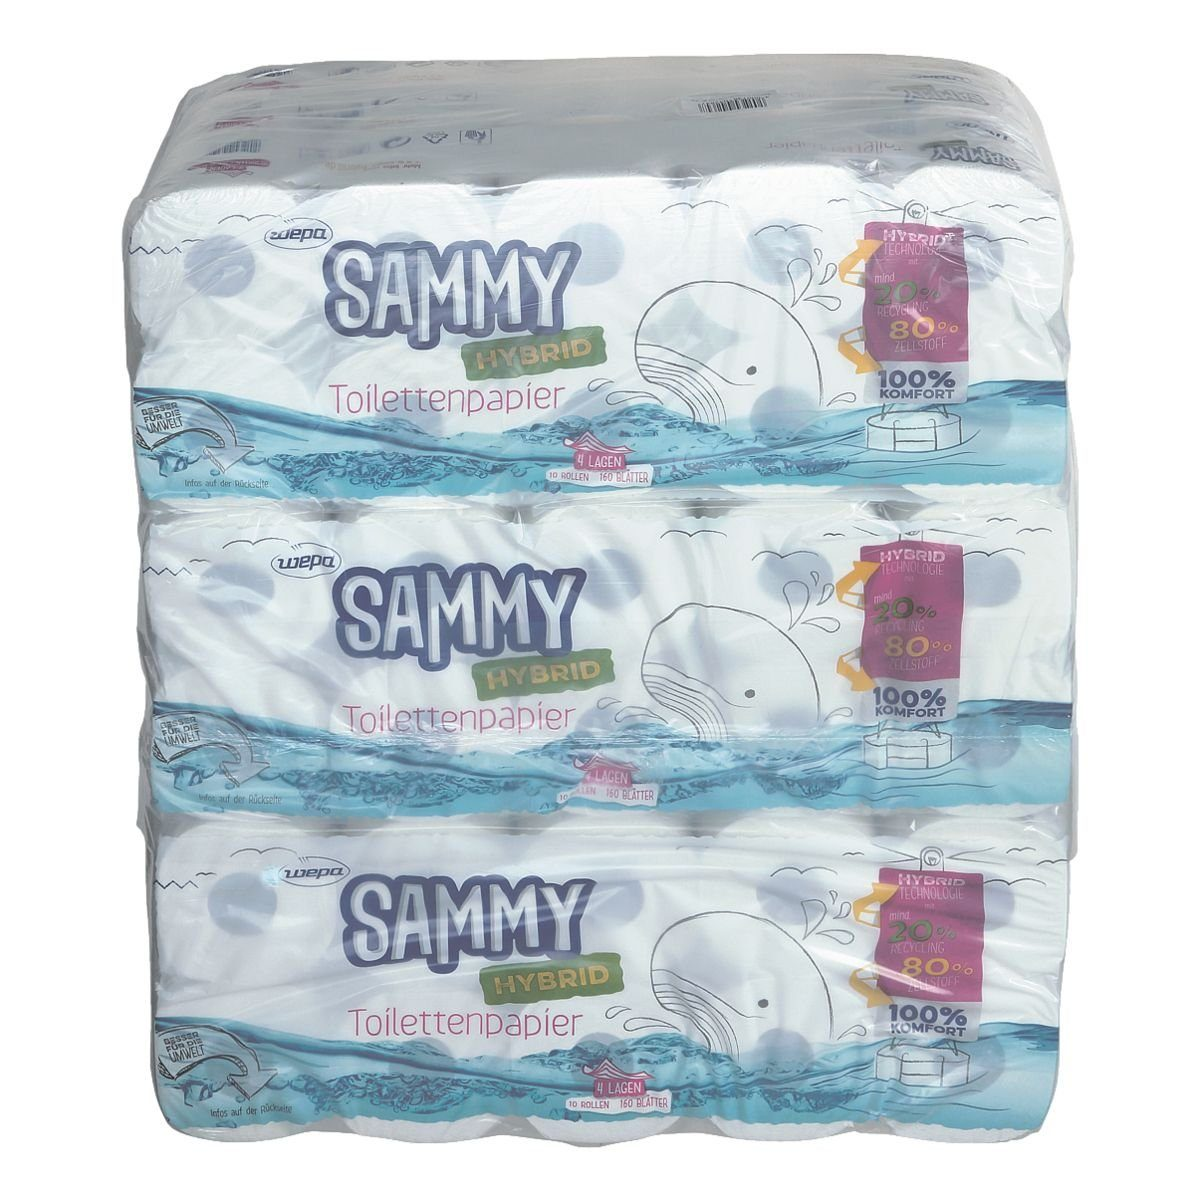 wepa Sammy Toilettenpapier »Hybrid«